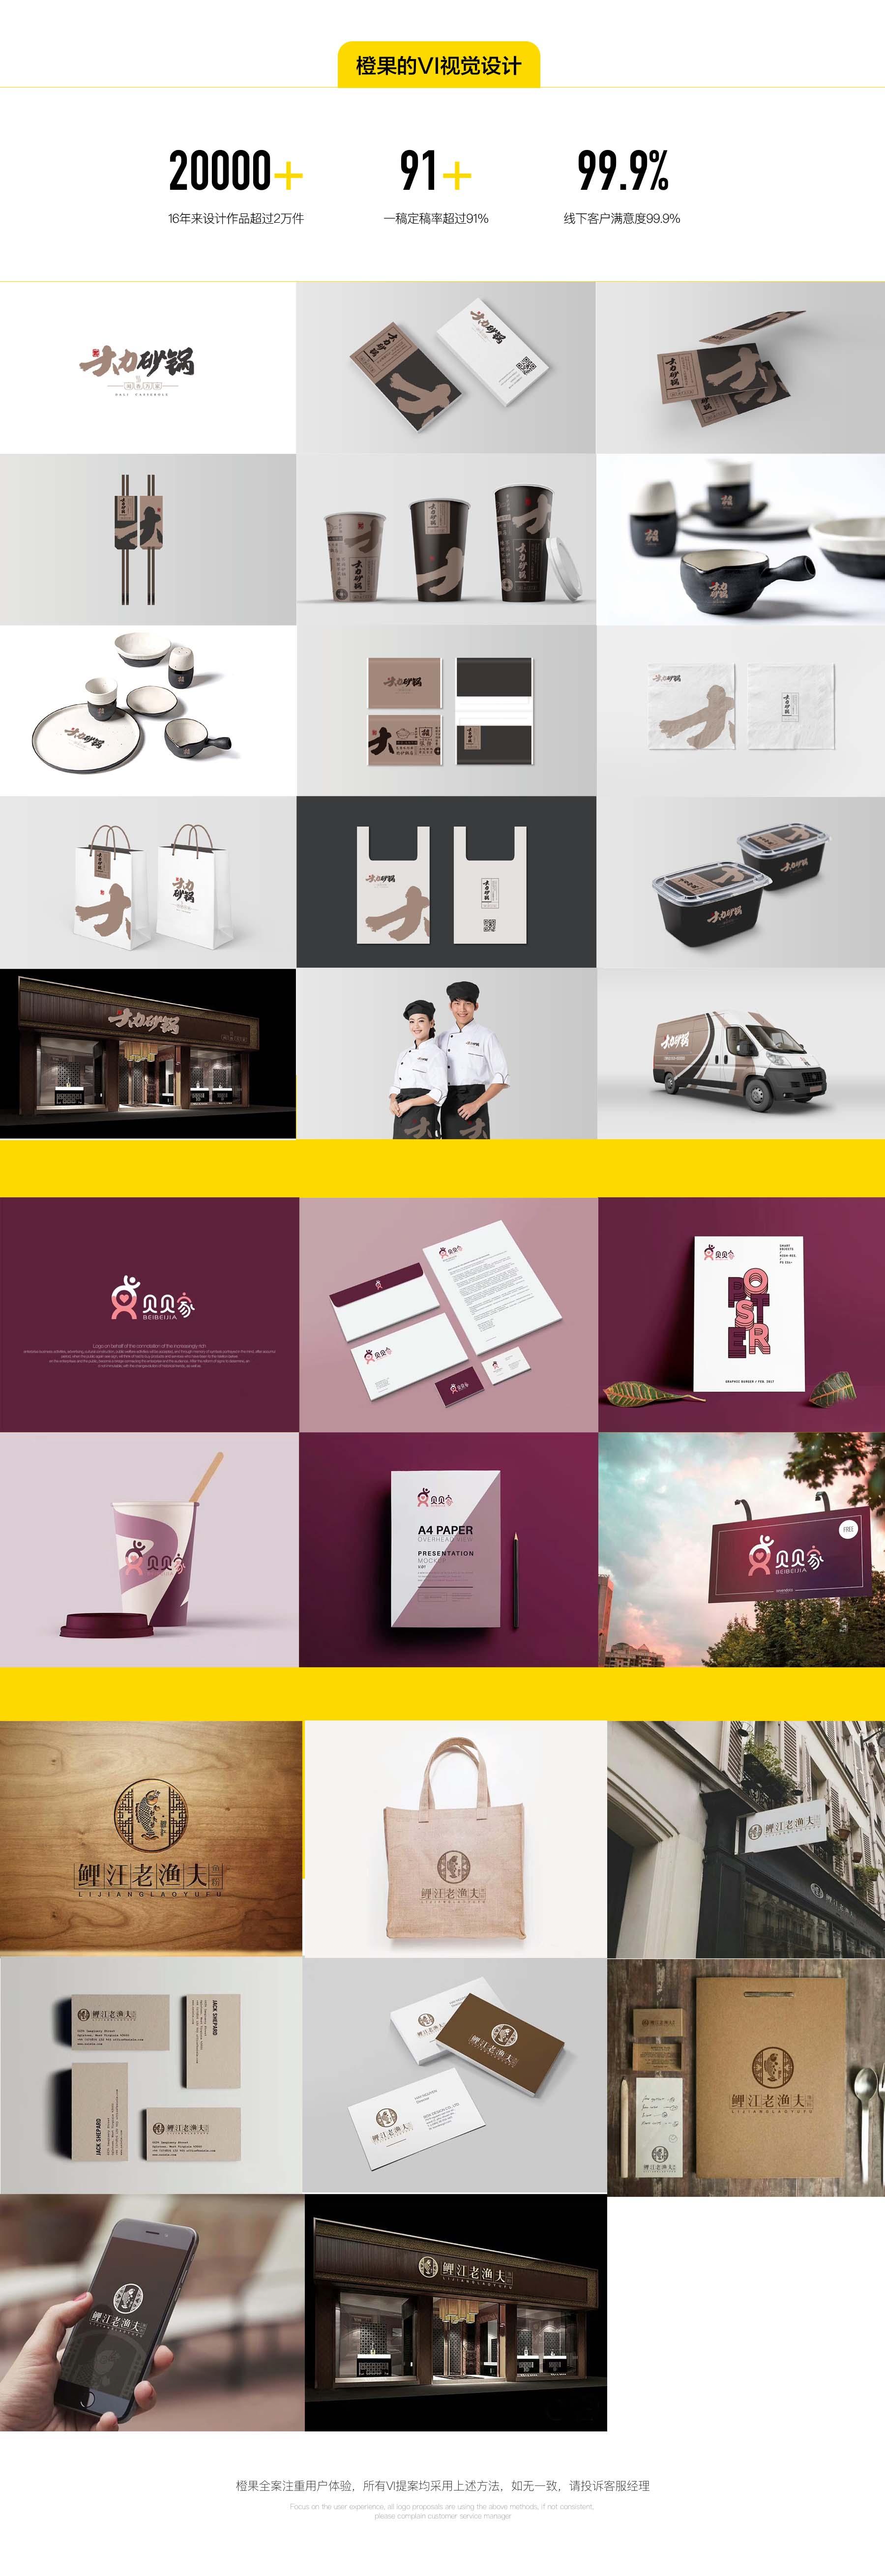 VI系统设计_橙果全案VIS企业导视系统娱乐酒店餐饮旅游医疗品牌VI设计4